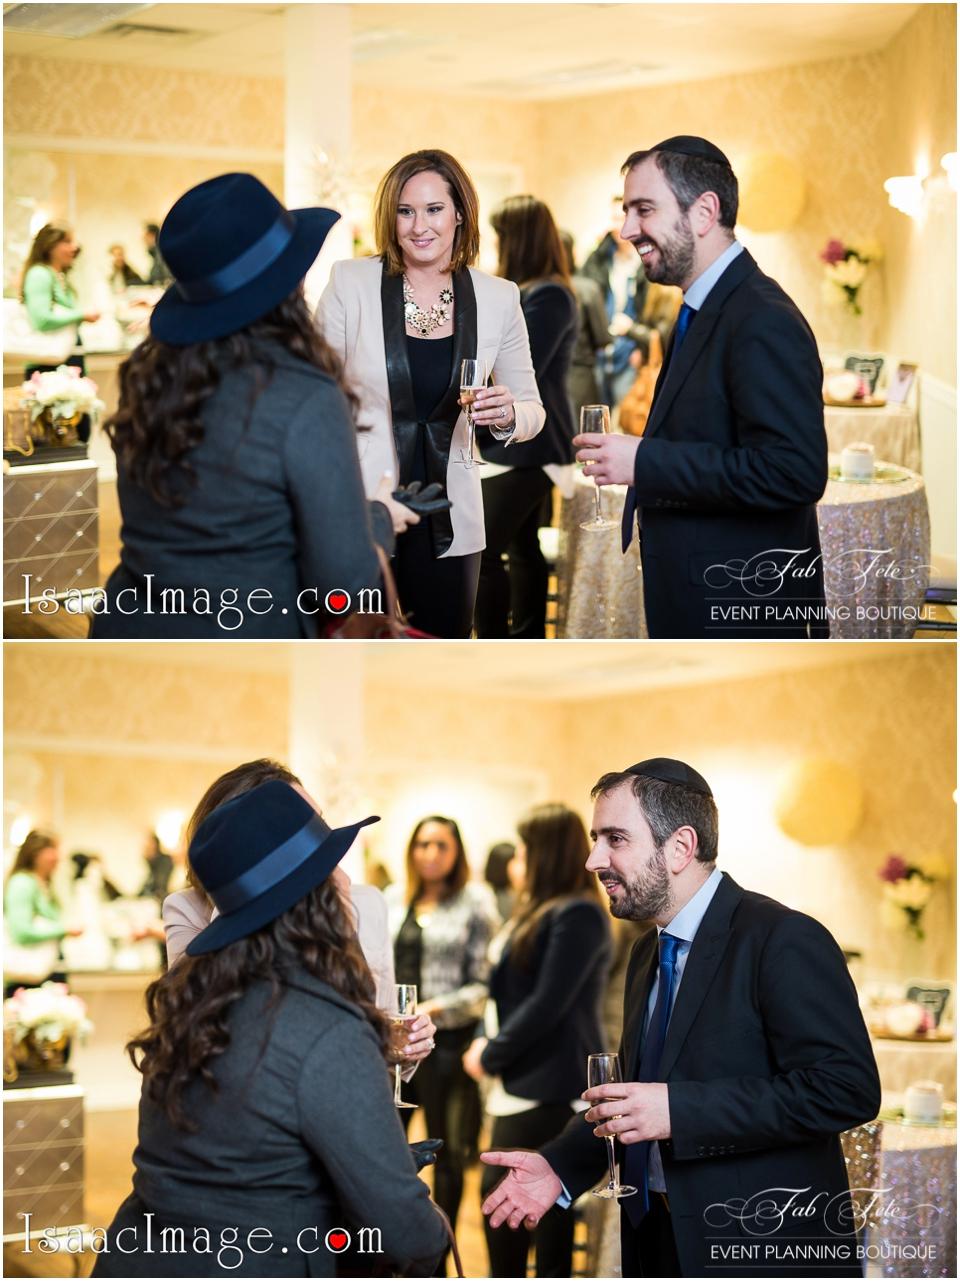 Fab Fete Toronto Wedding Event Planning Boutique open house_6463.jpg